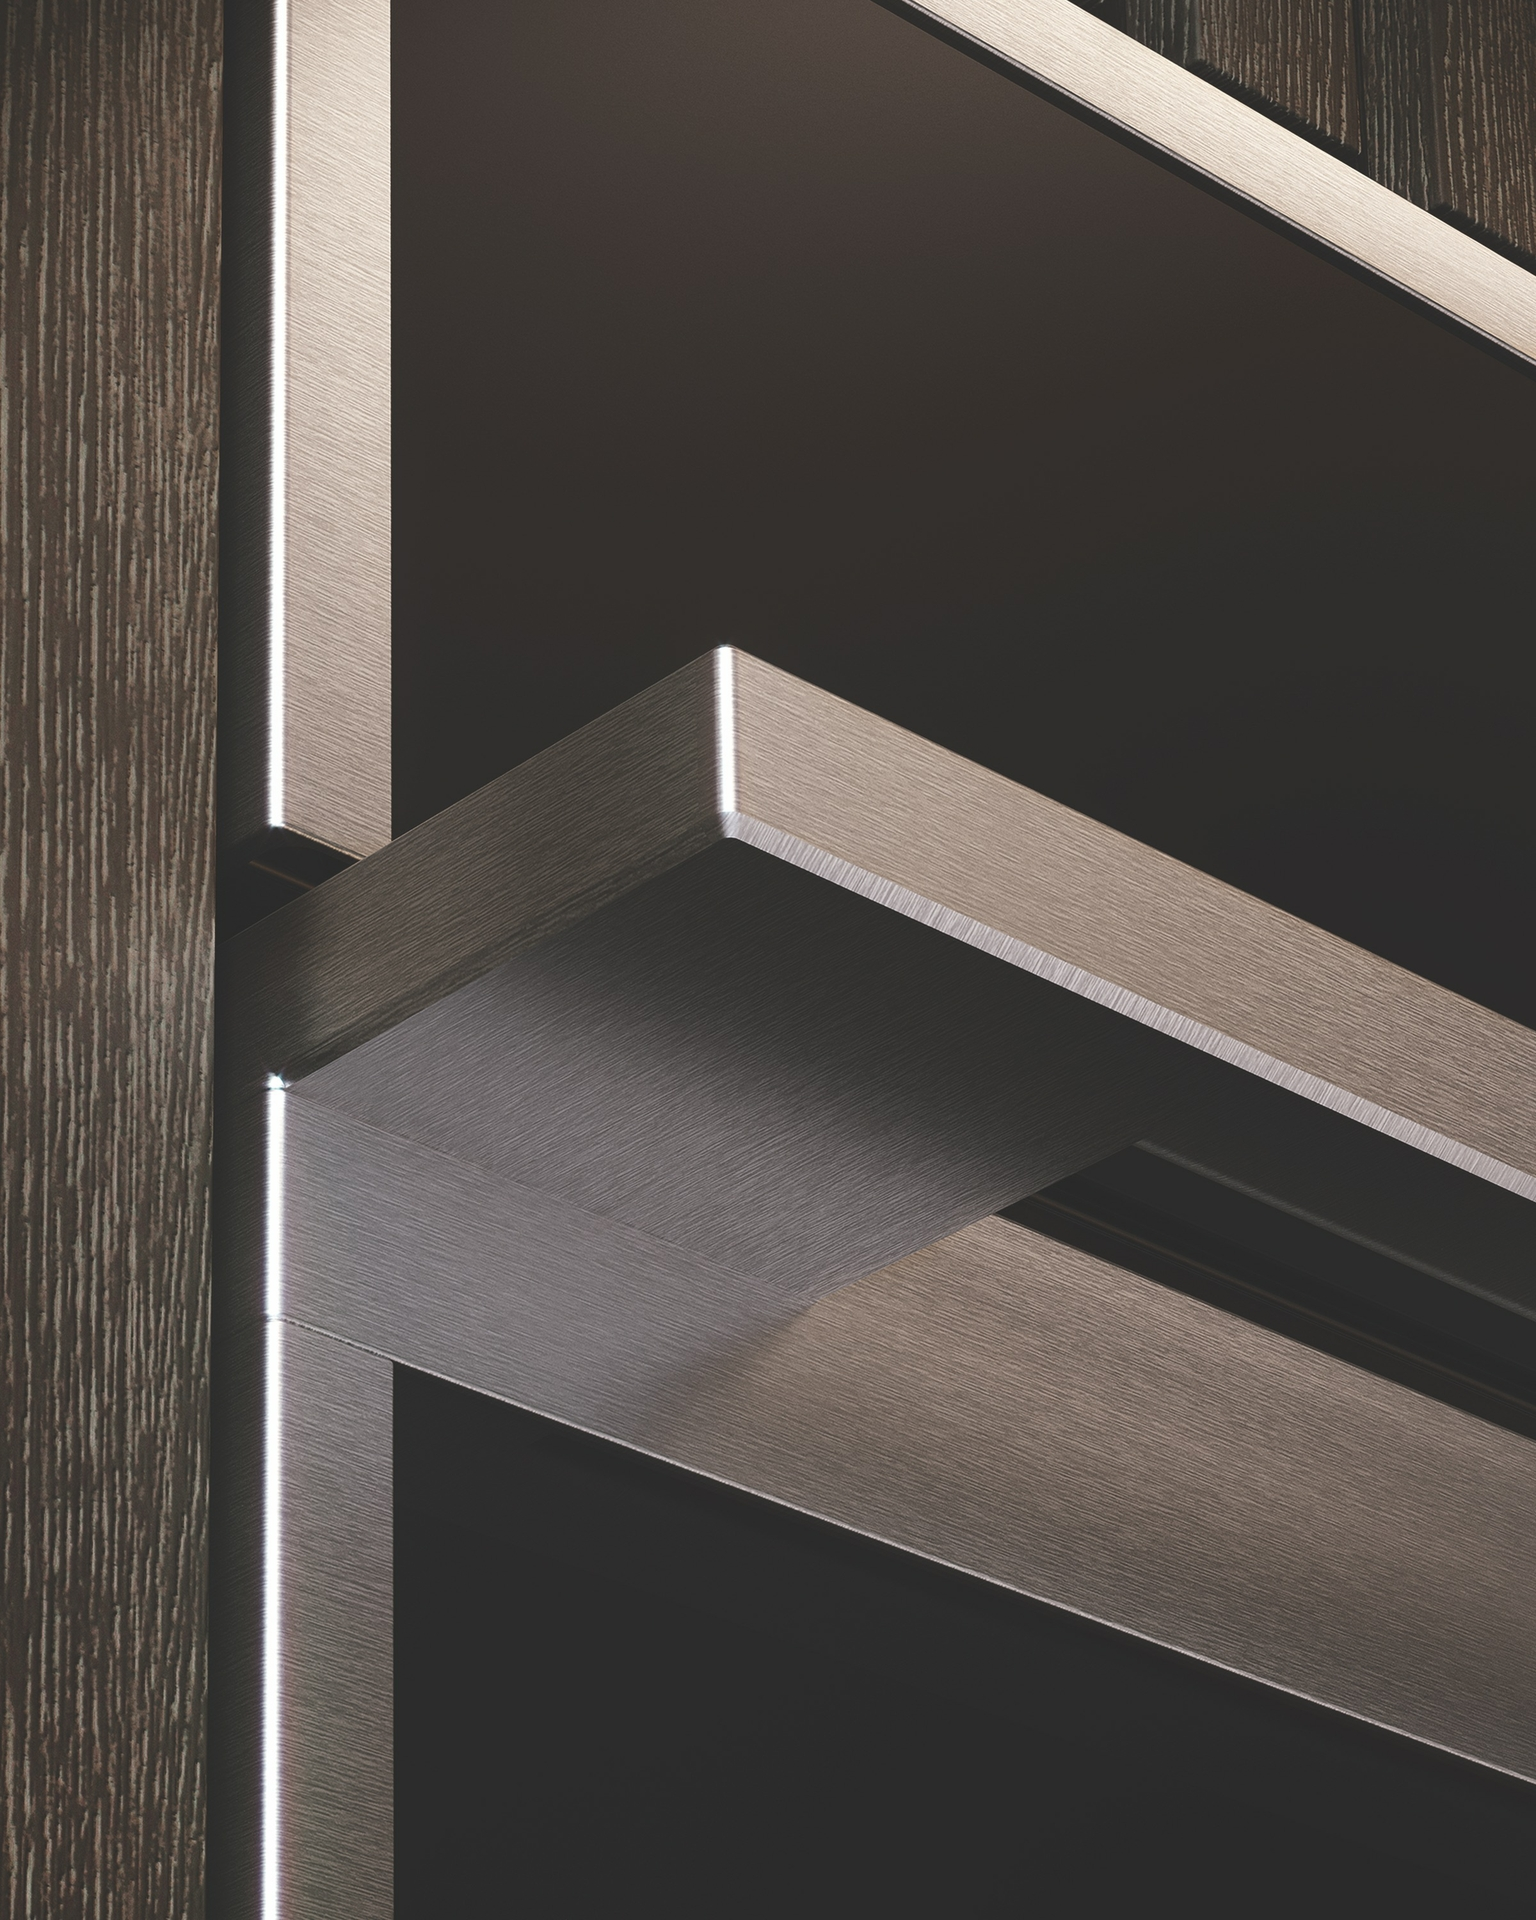 Monogram Minimalist Wall Oven Handle Detail